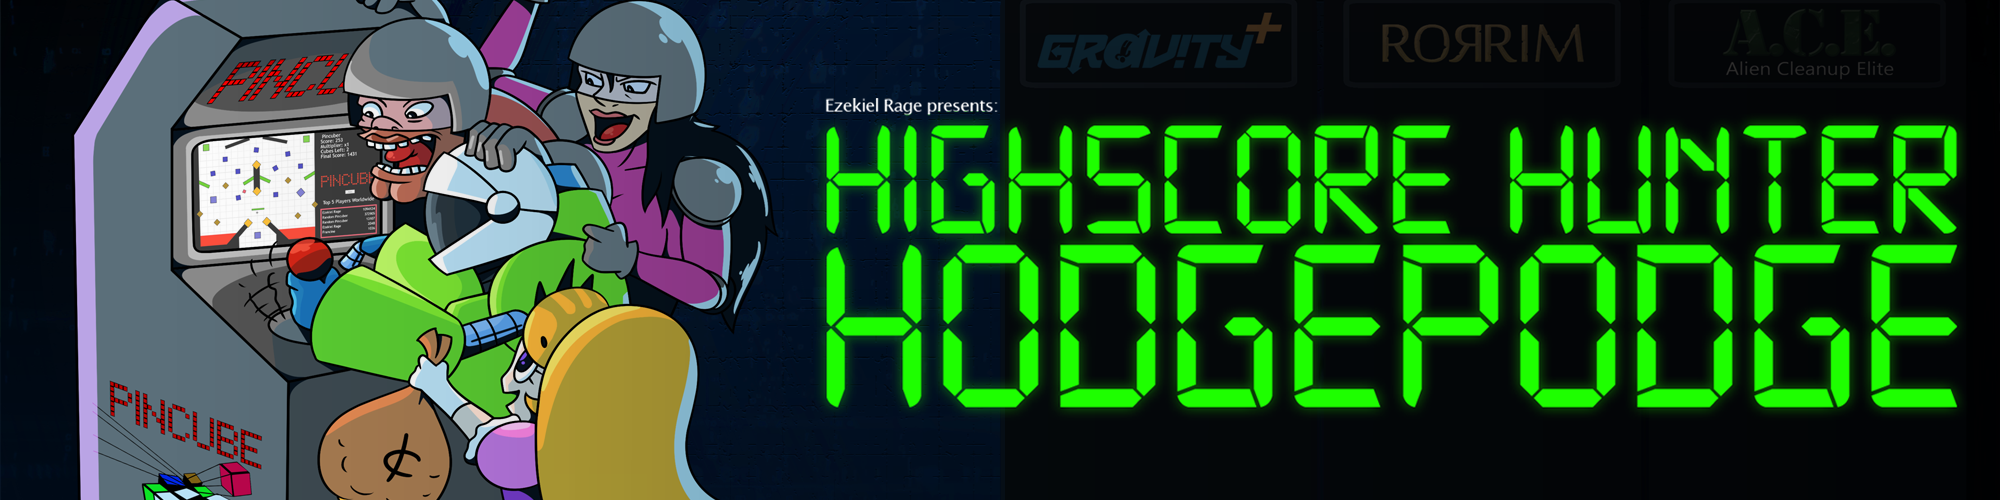 Highscore Hunter Hodgepodge